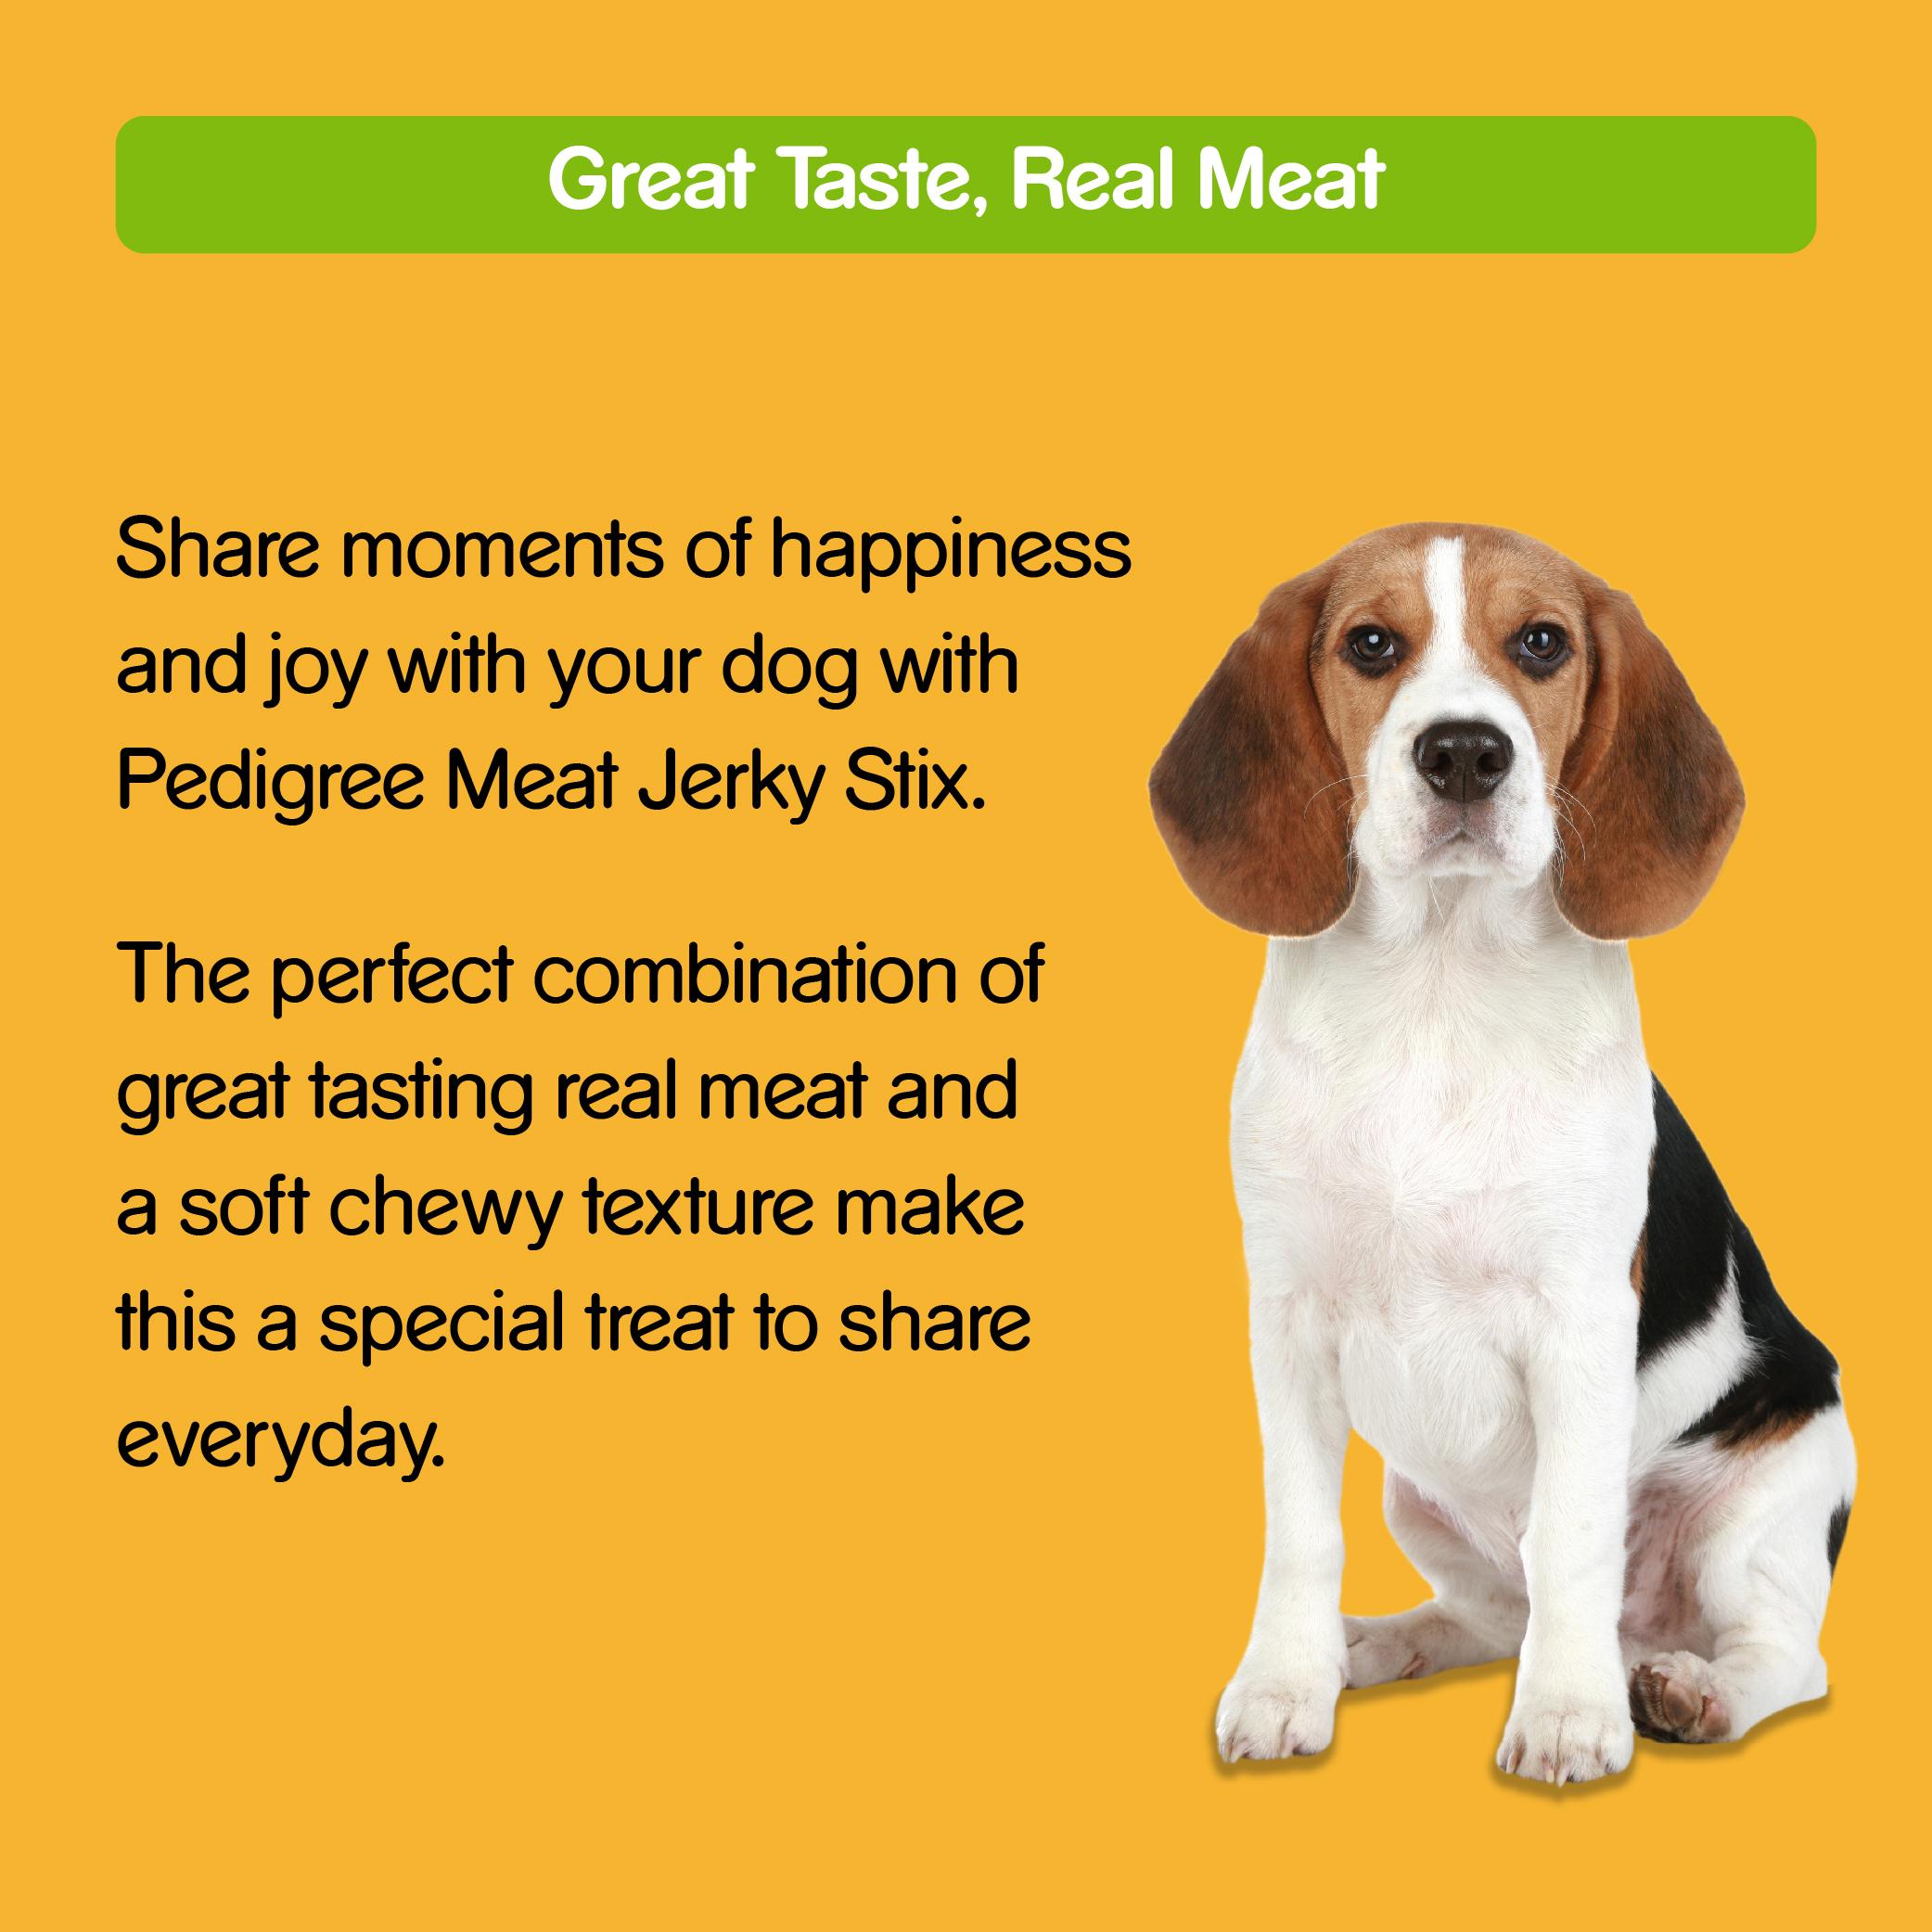 Pedigree Meat Jerky Stix Bacon Flavor - 60 gm (Pack of 12)